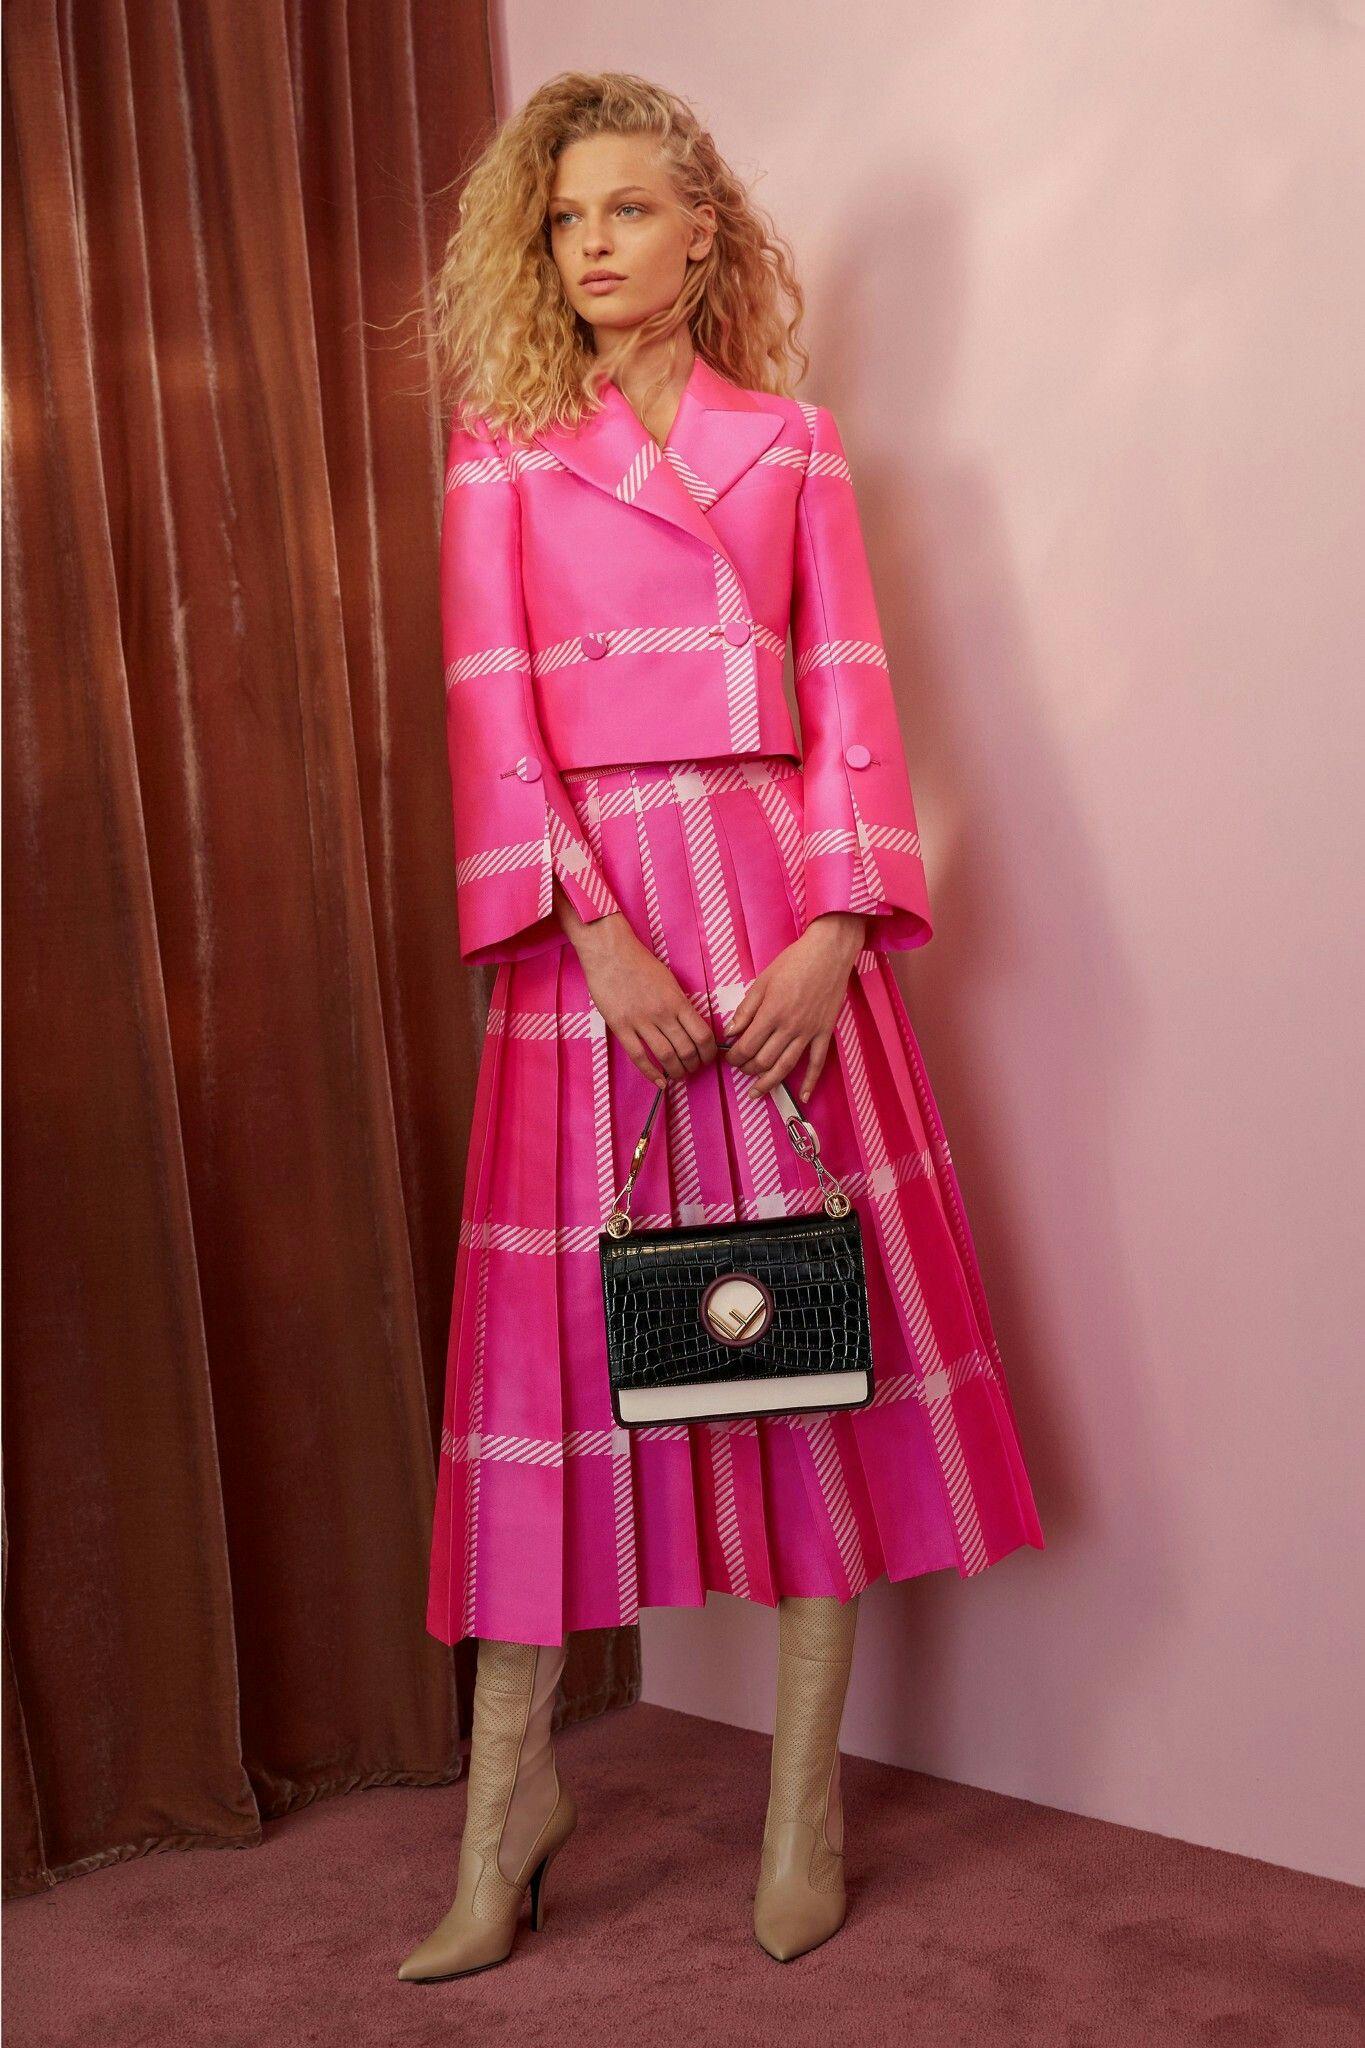 Pin de Norma Brodery en ropa fashion | Pinterest | Elegancia, Puros ...